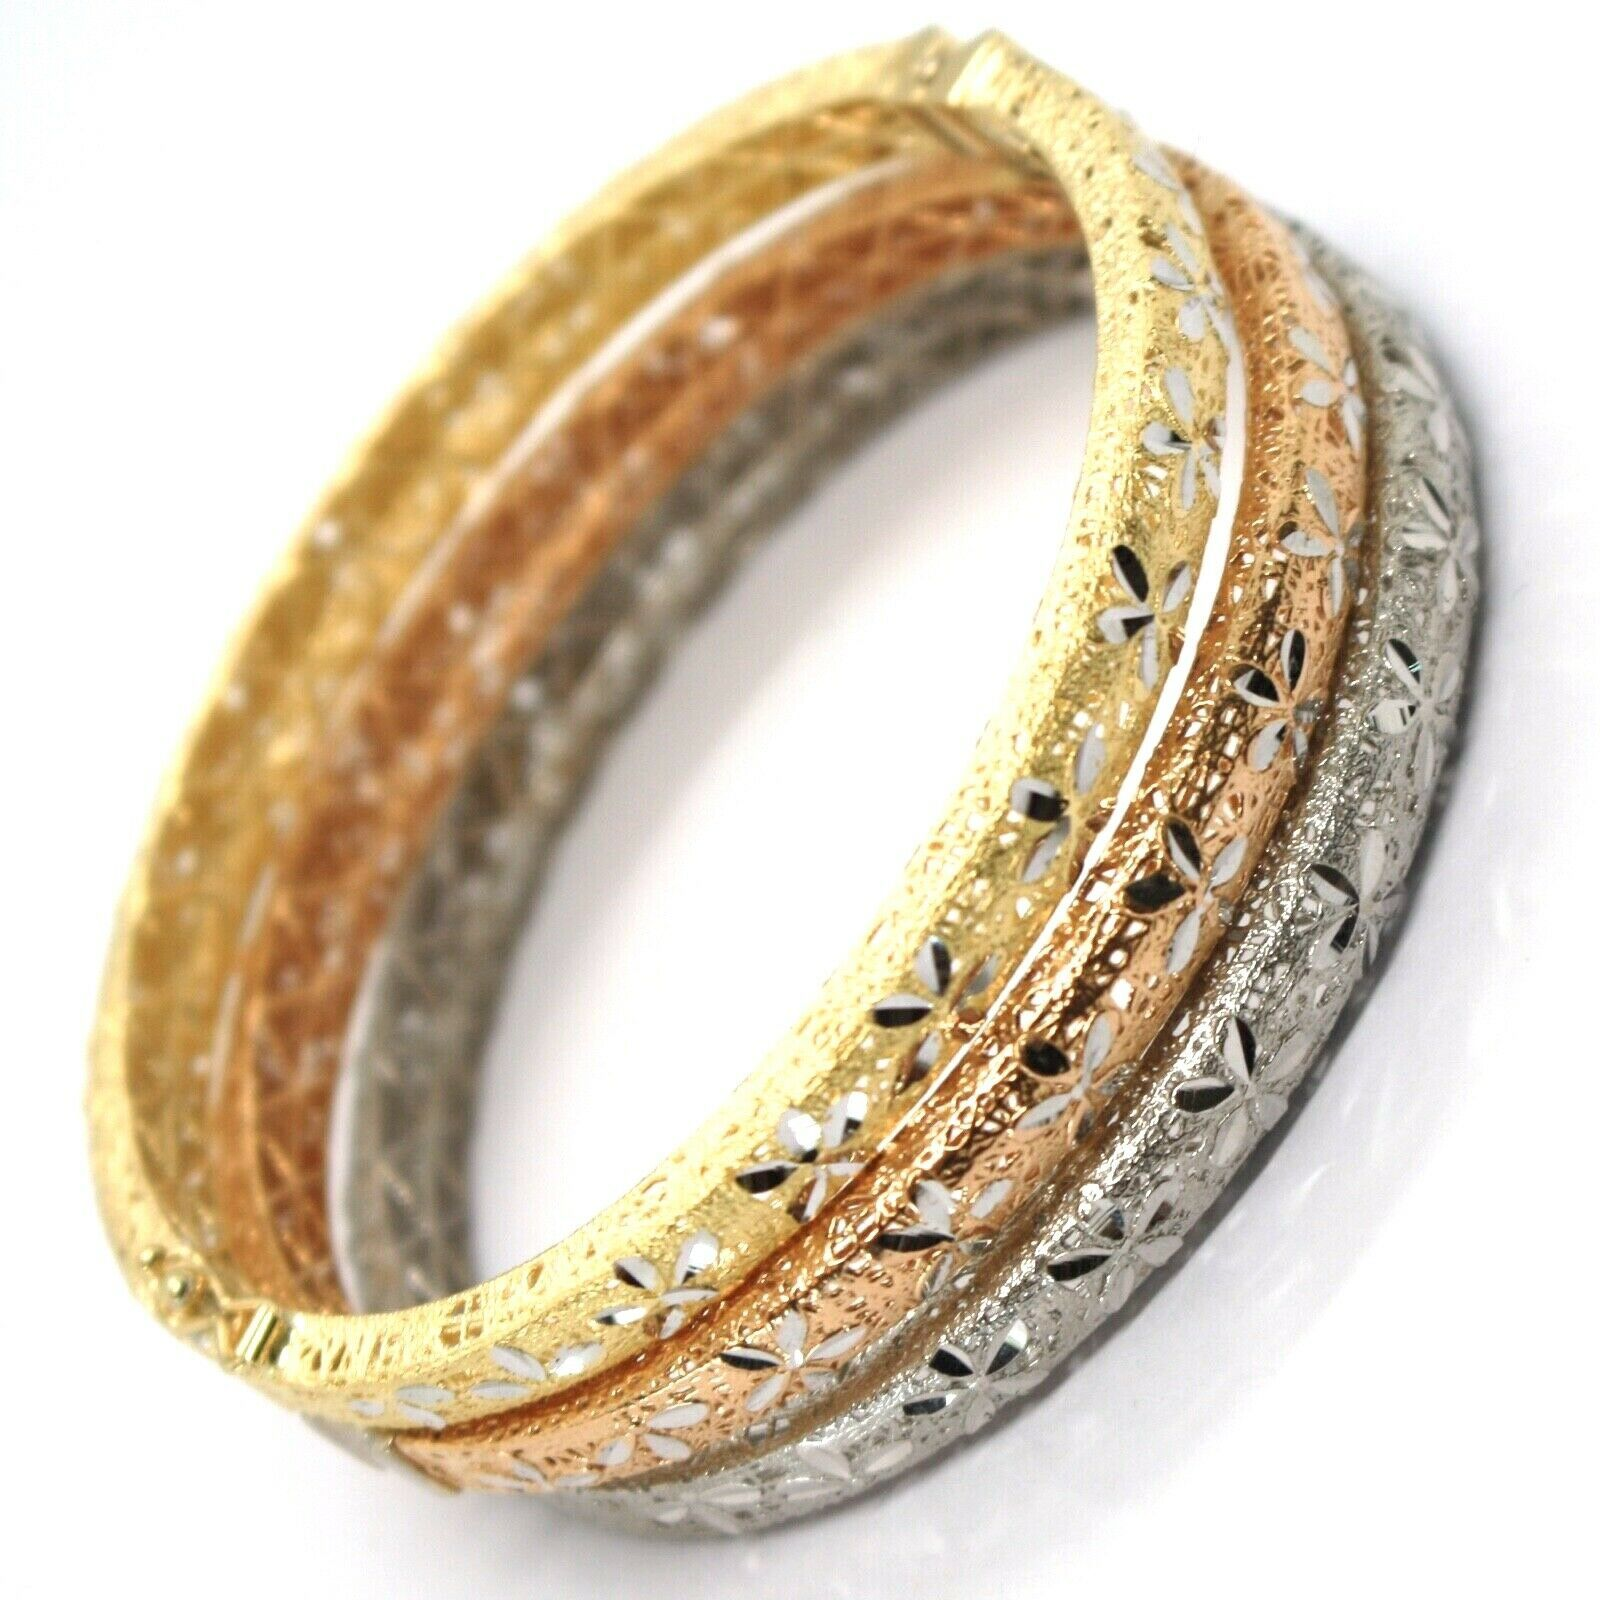 Bracelet en or 750 18K, Jaune ou Blanc ou Rose, Rigide, Lavoration Nid, Fleurs